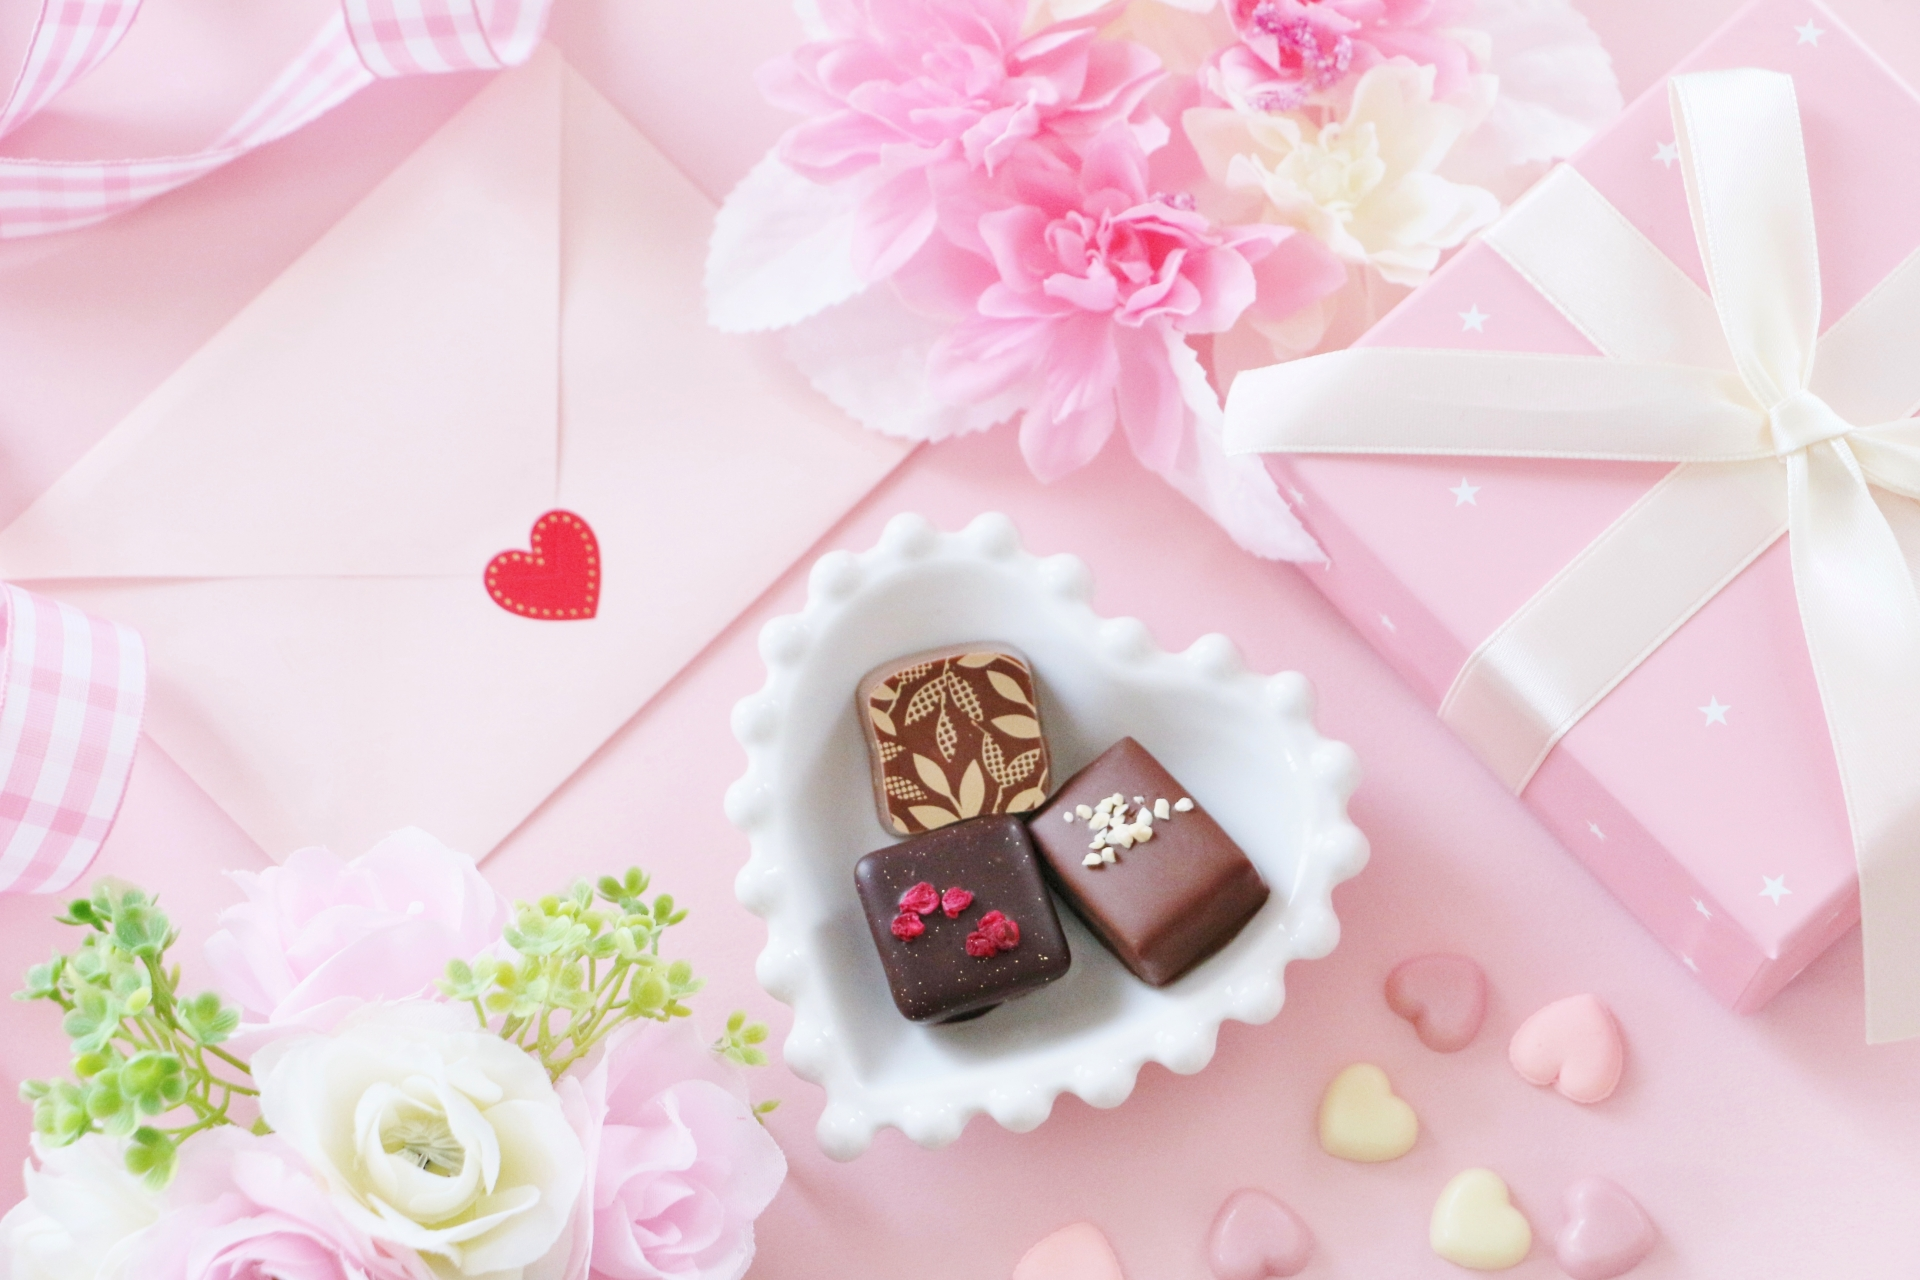 Cenbless 成増フェイシャル&ネイルサロン 2020年バレンタイン